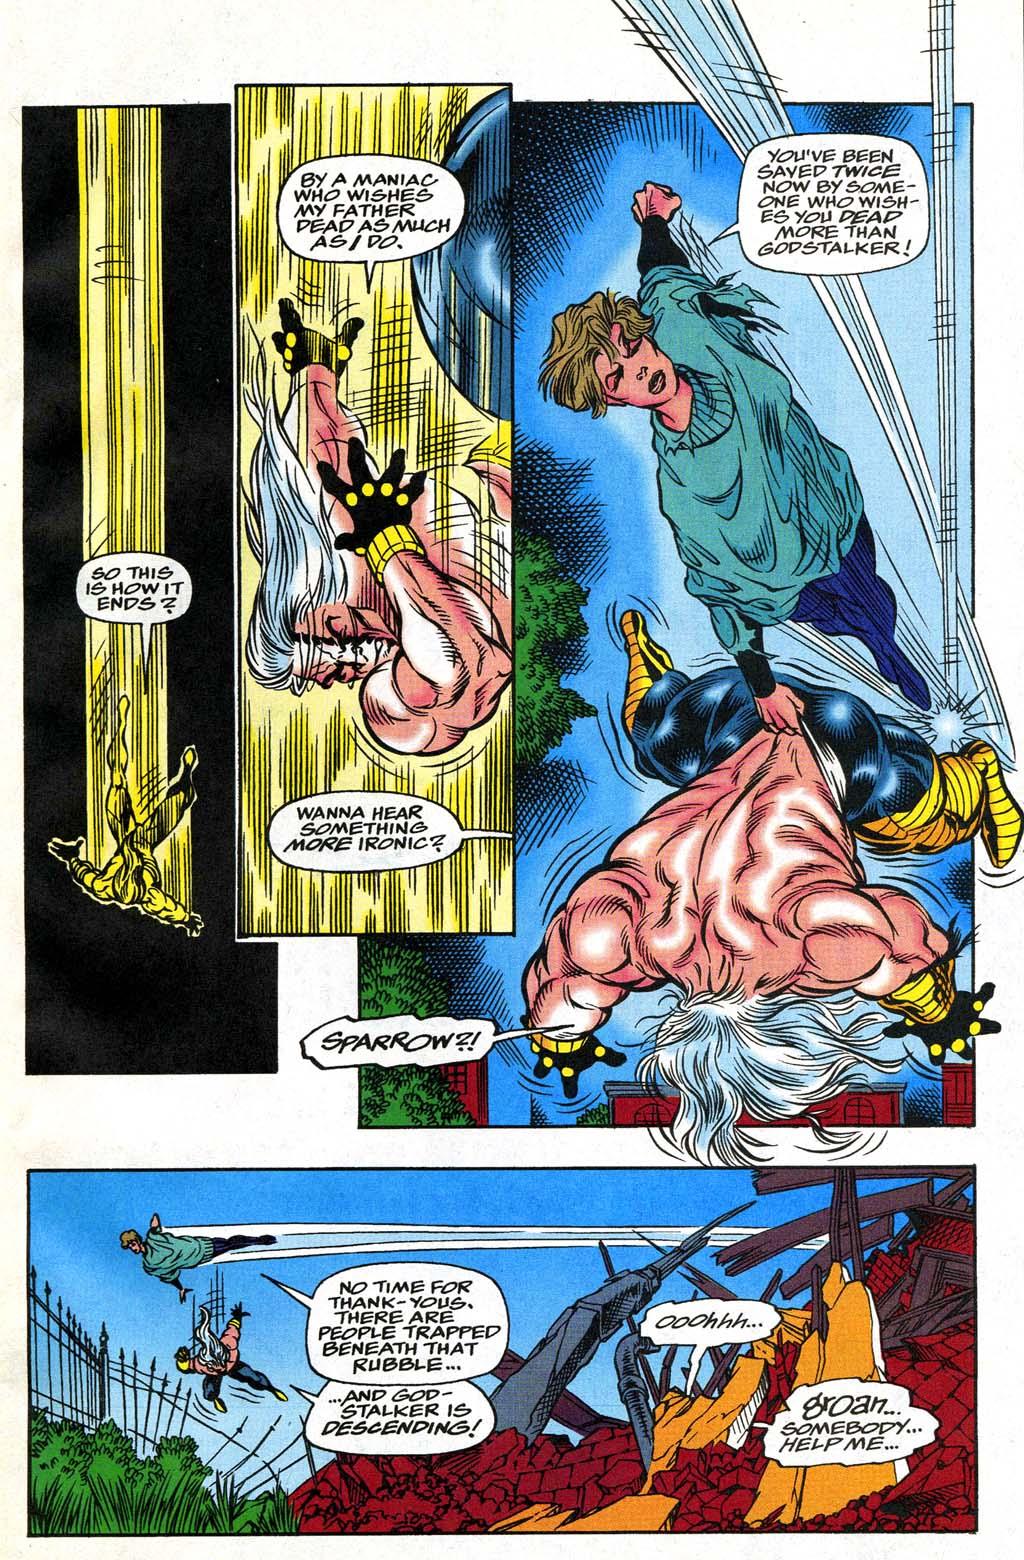 Read online Blackwulf comic -  Issue #8 - 6